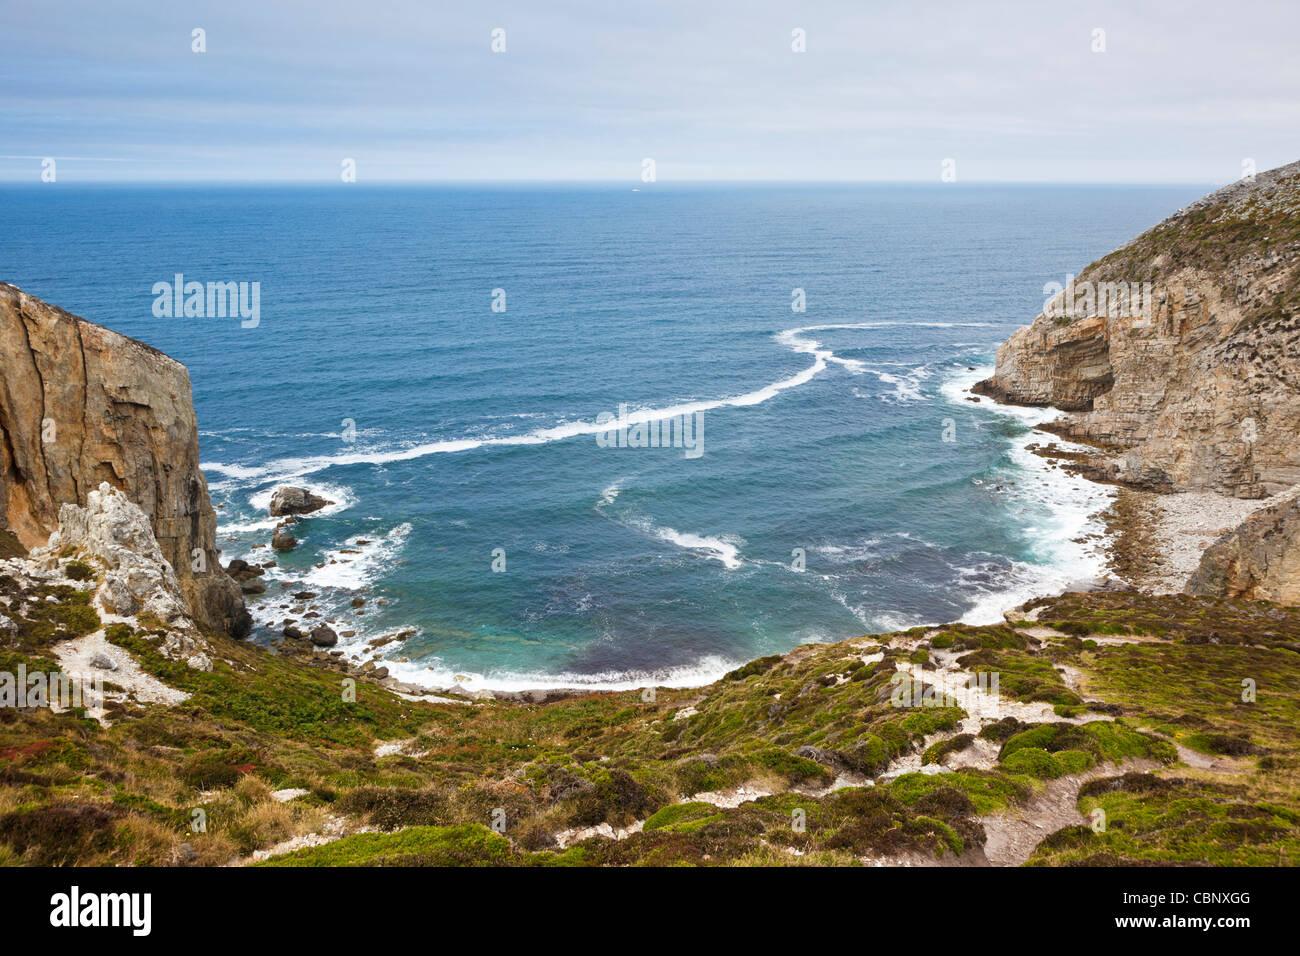 Coast at Cap de la Chevre, Crozon Peninsula, Finistere, Brittany, France - Stock Image